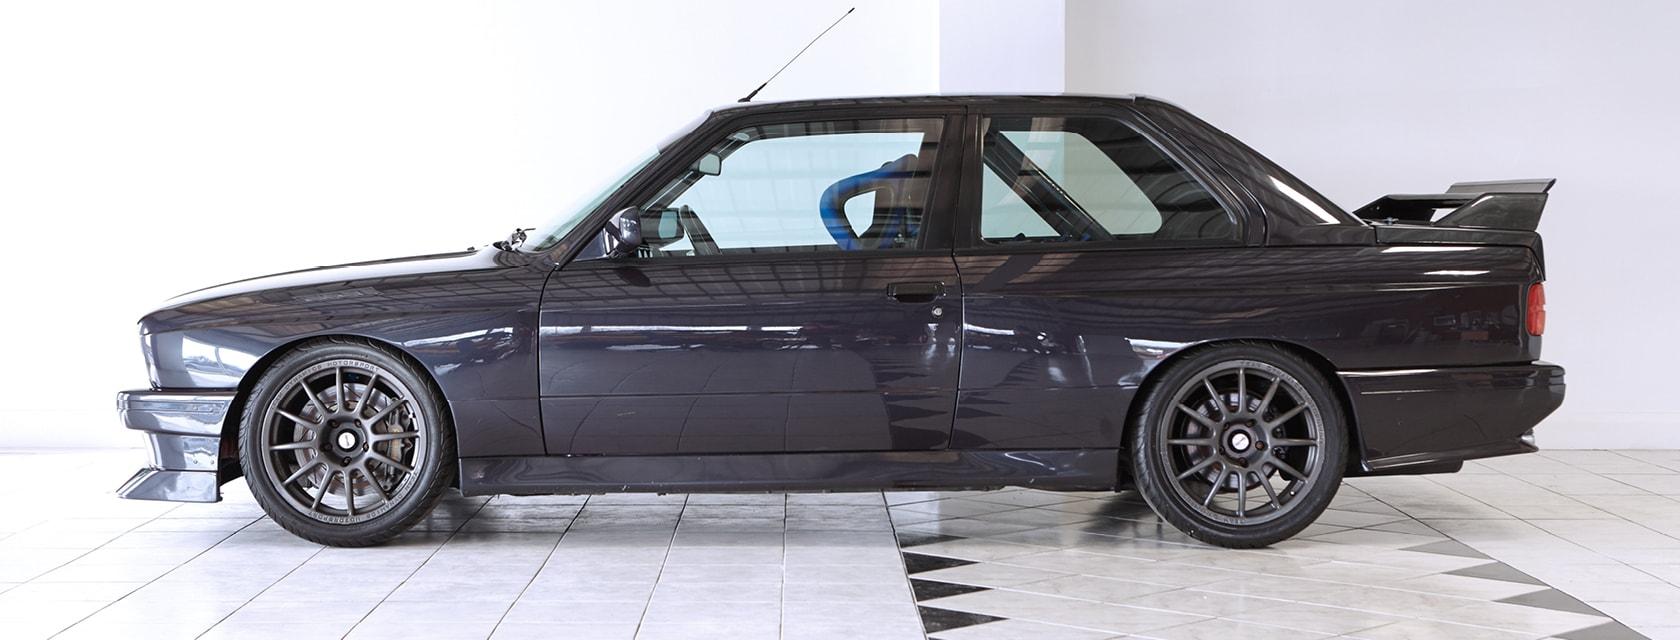 Bmw E Race Car For Sale Uk